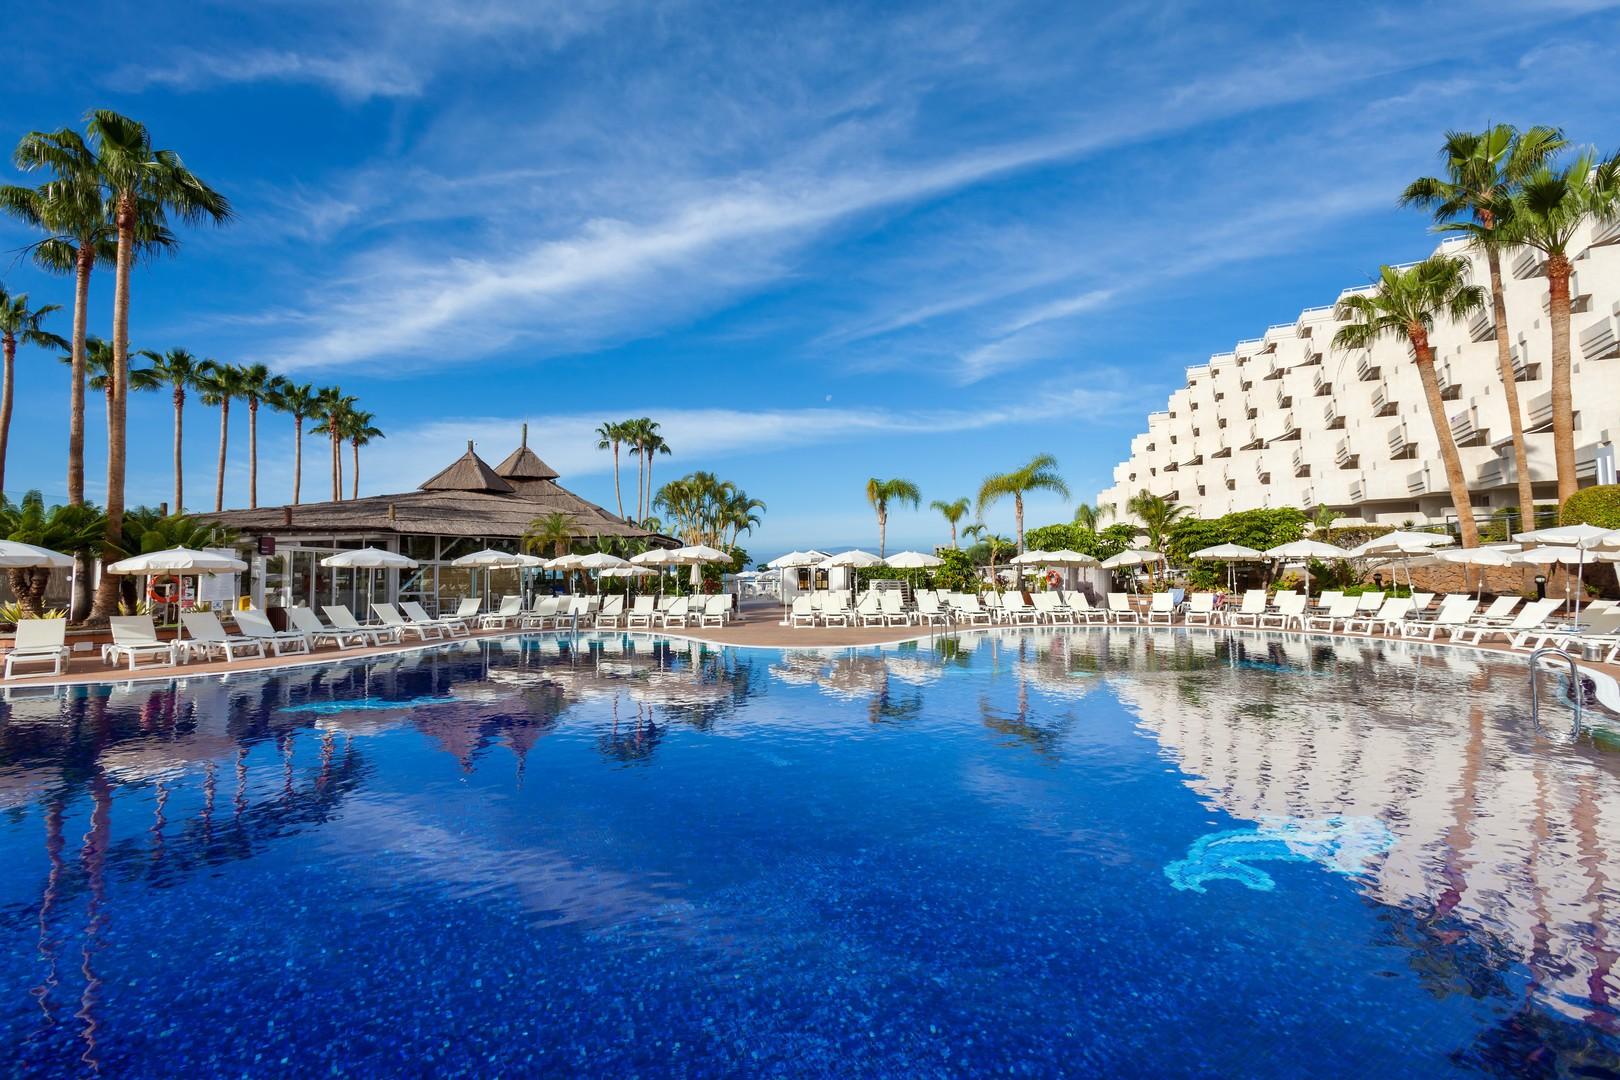 Hotel Landmar Playa La Arena #3